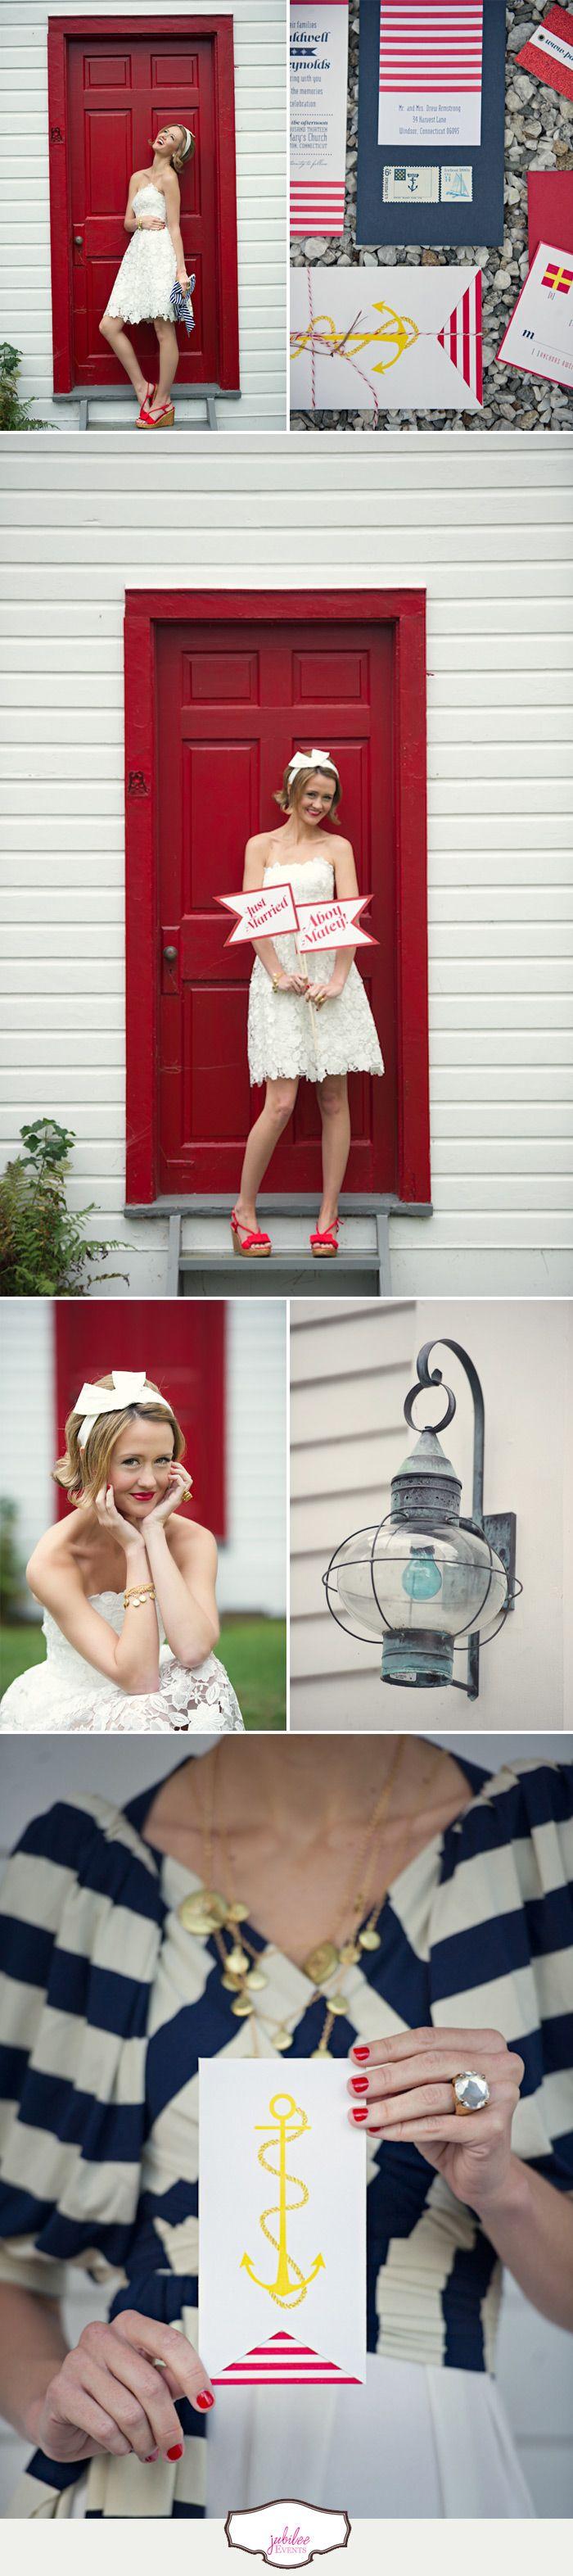 44 best G &G wedding - wedding cards images on Pinterest | Wedding ...